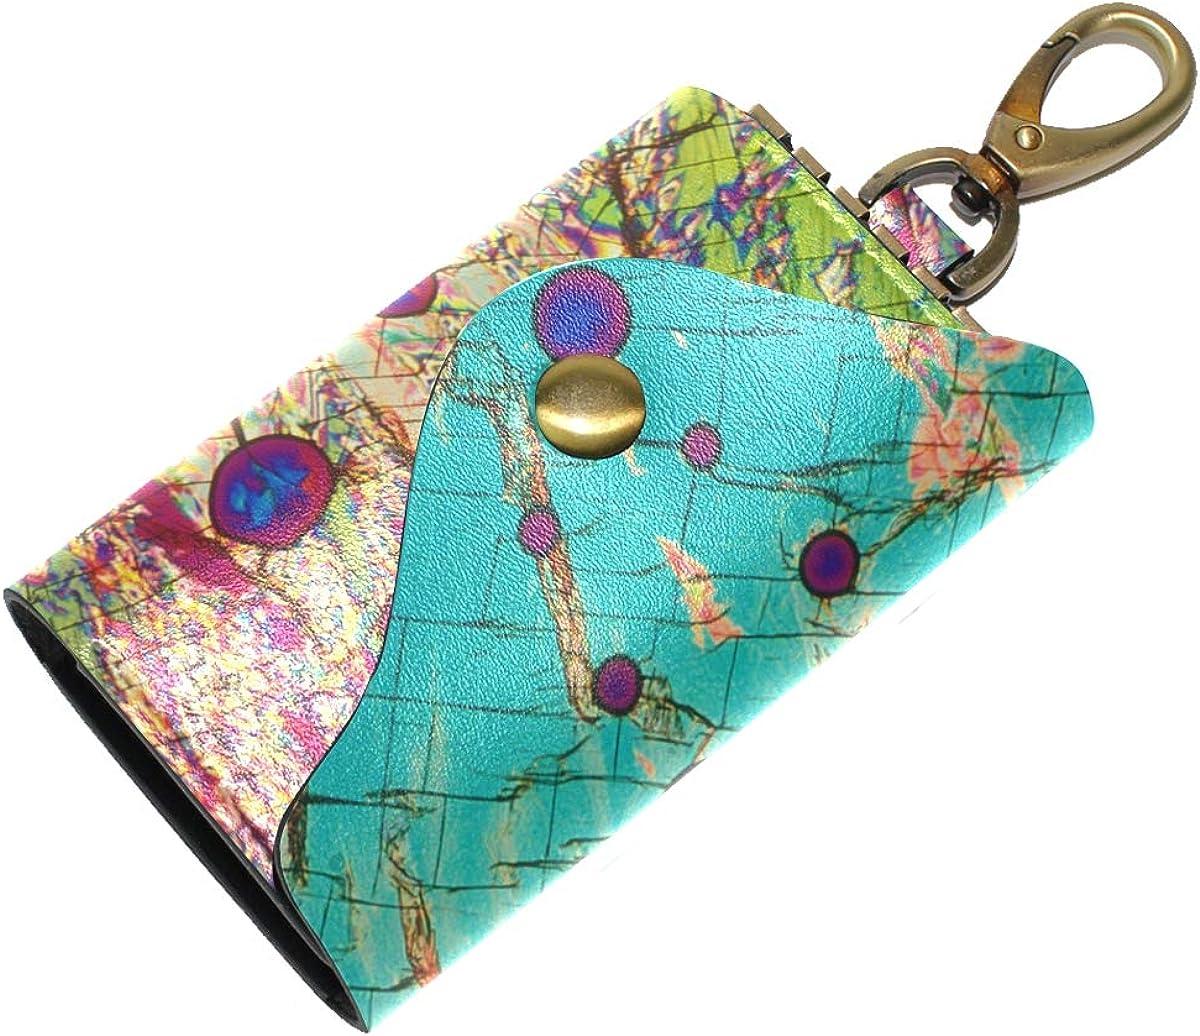 KEAKIA Art Leather Key Case Wallets Tri-fold Key Holder Keychains with 6 Hooks 2 Slot Snap Closure for Men Women